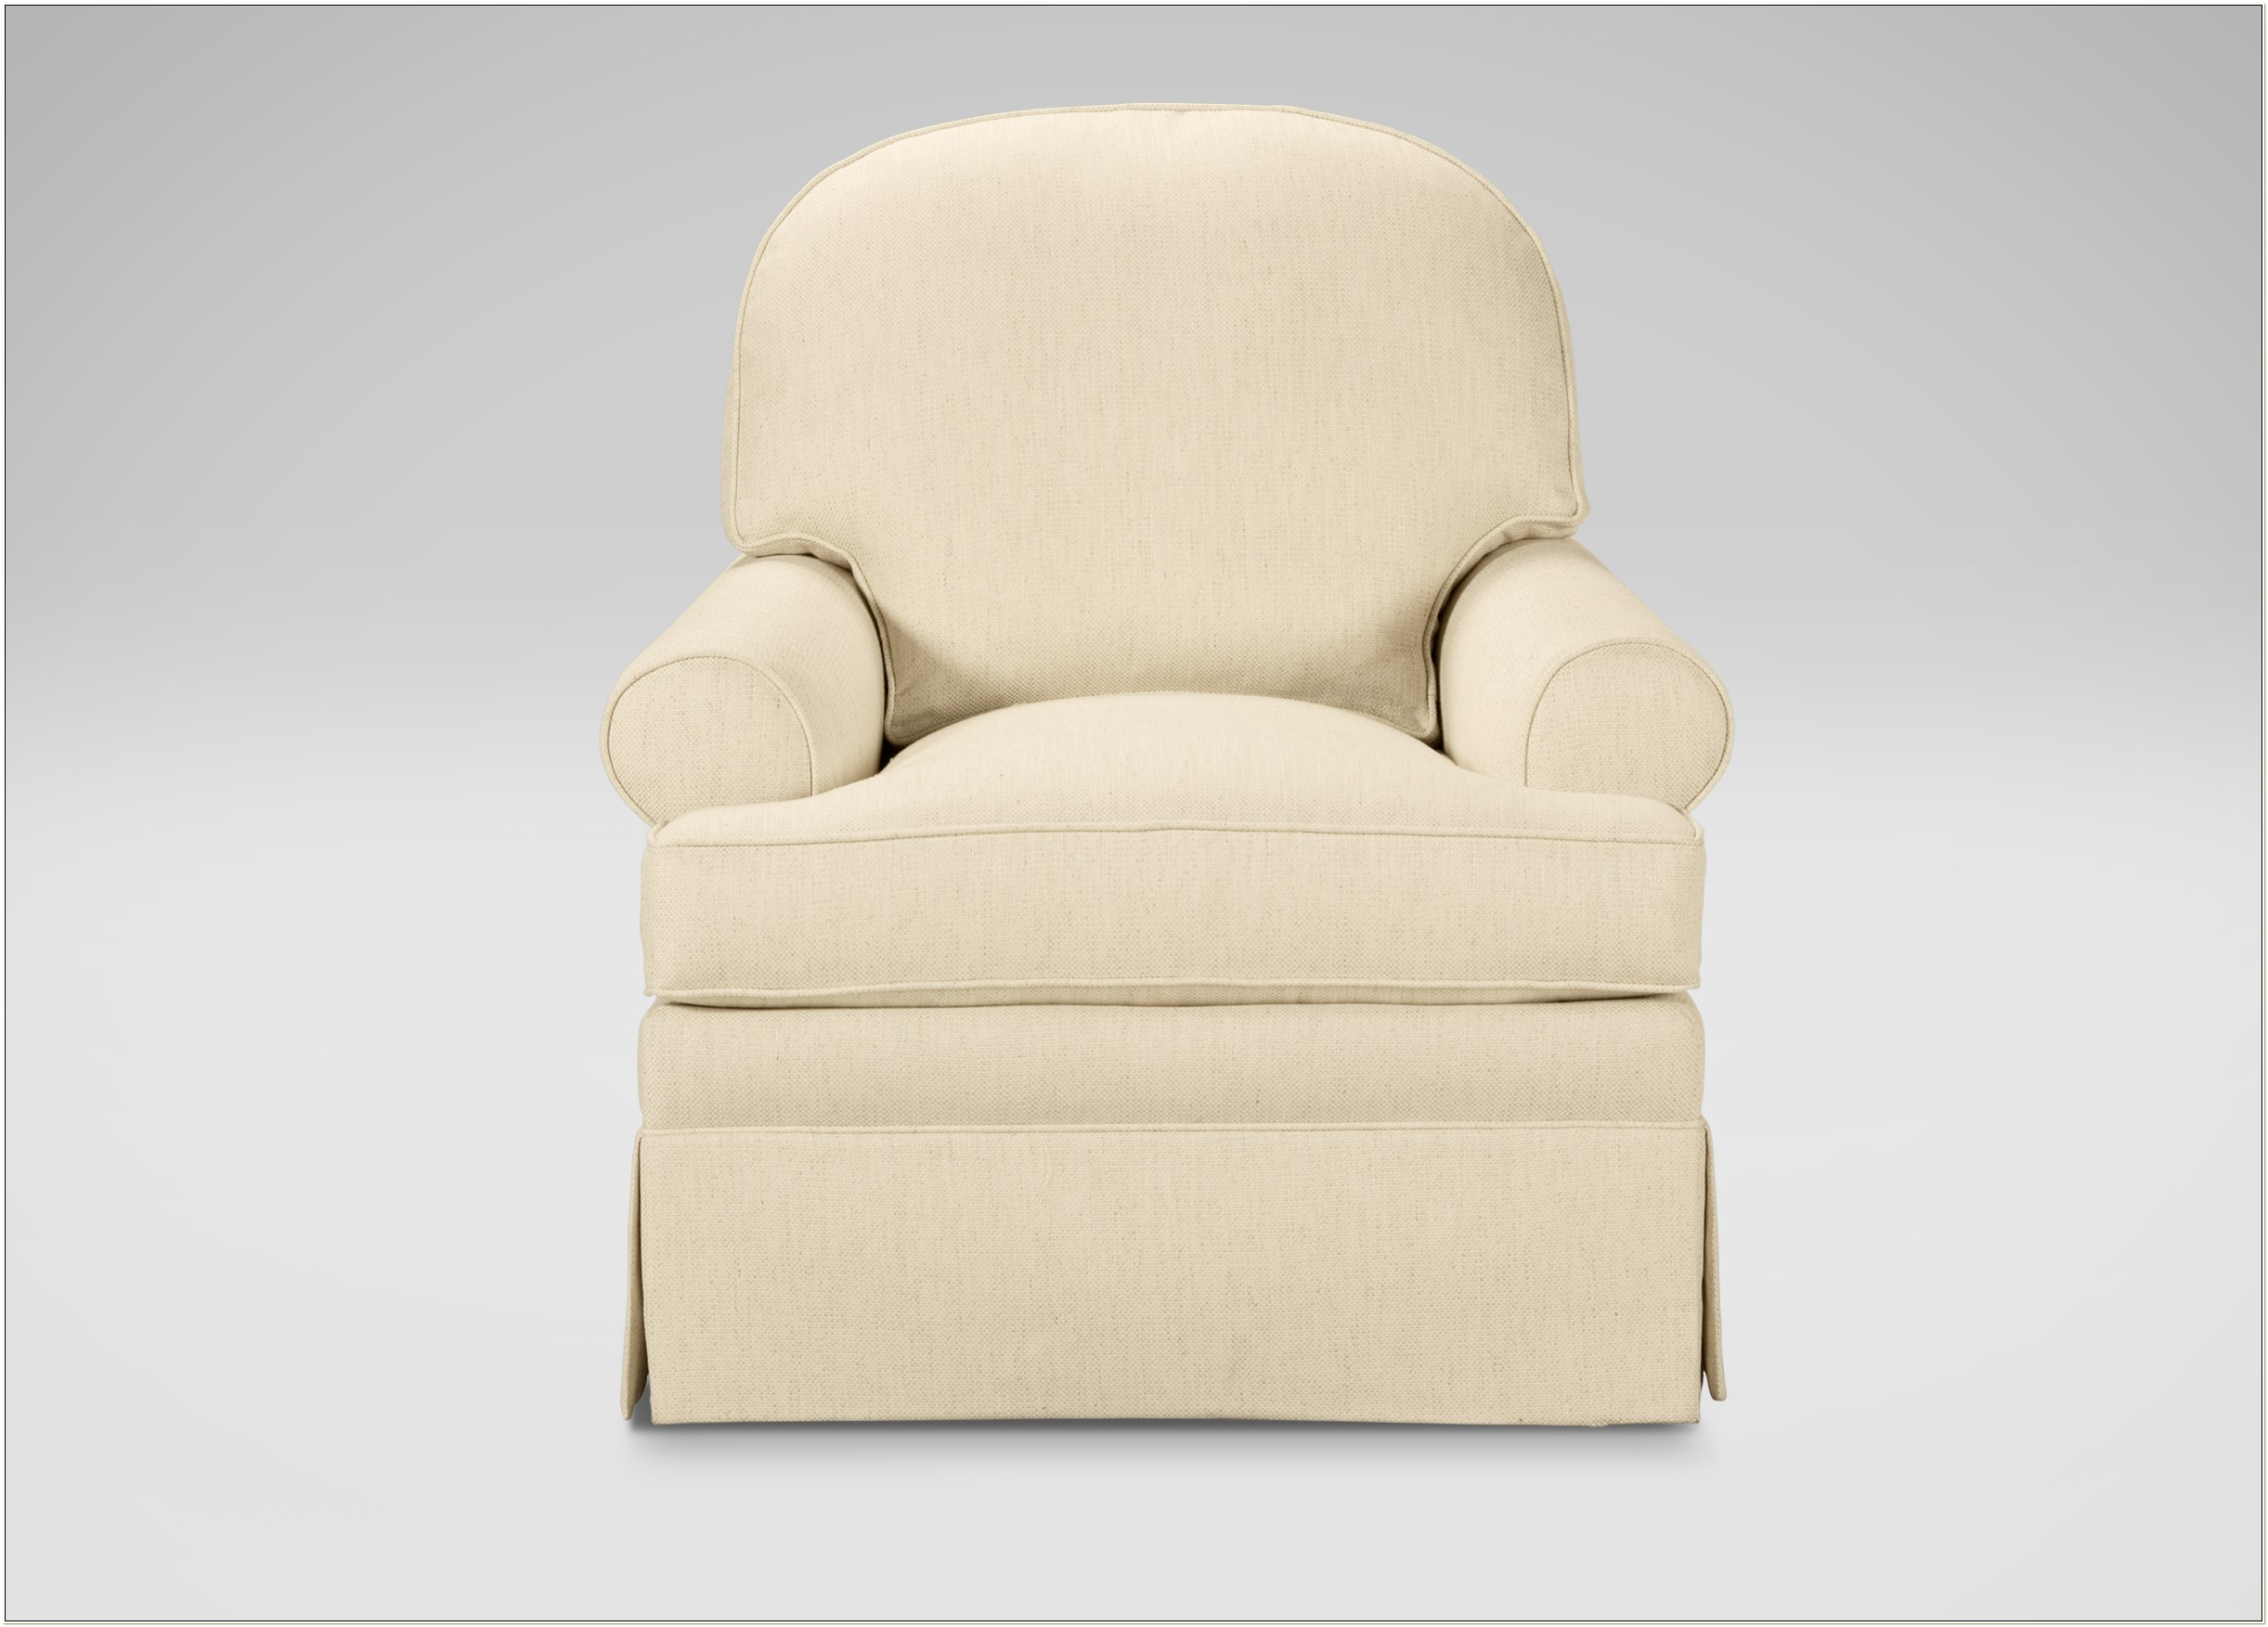 Ethan Allen Swivel Club Chairs